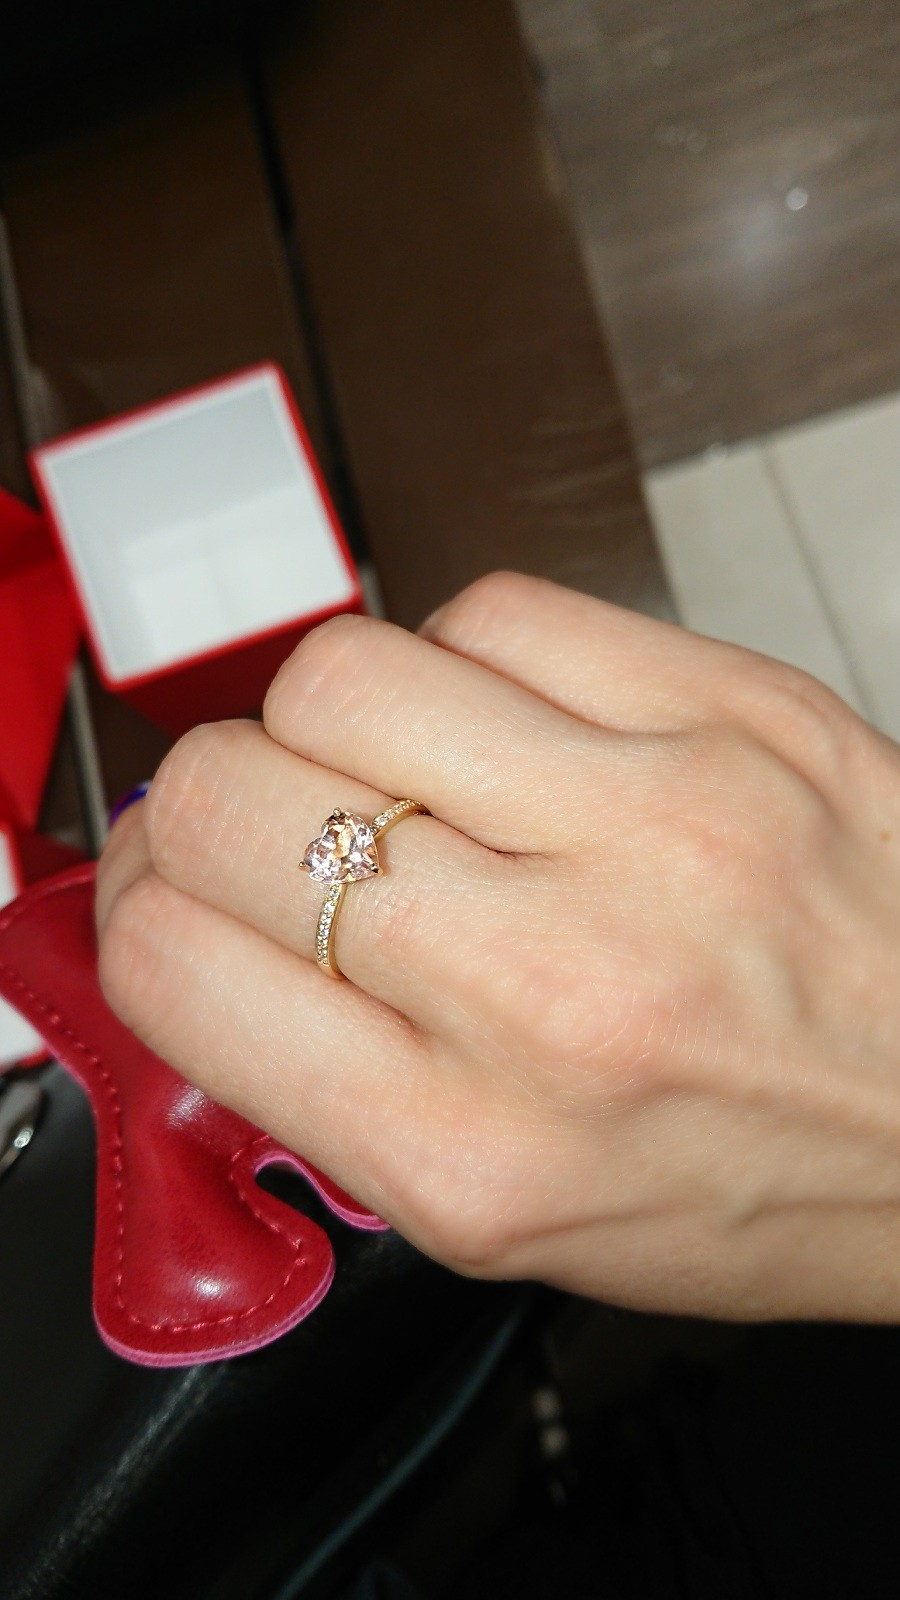 Безумно красивое кольцо 💍